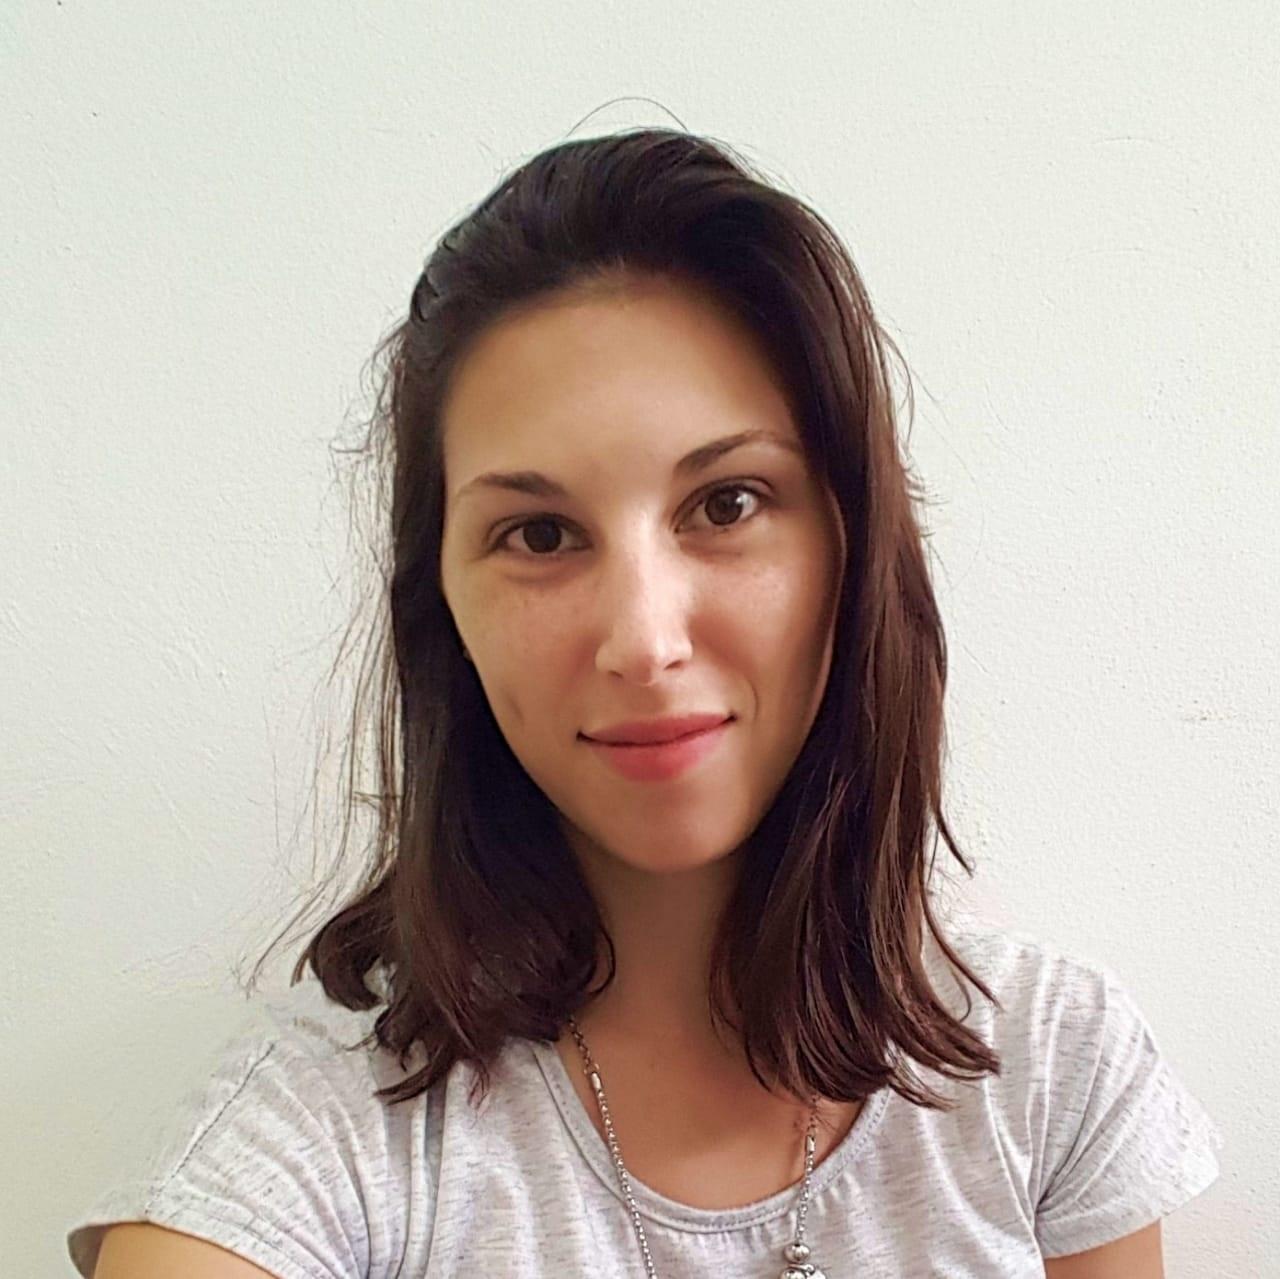 Licenciada Agustina Silva